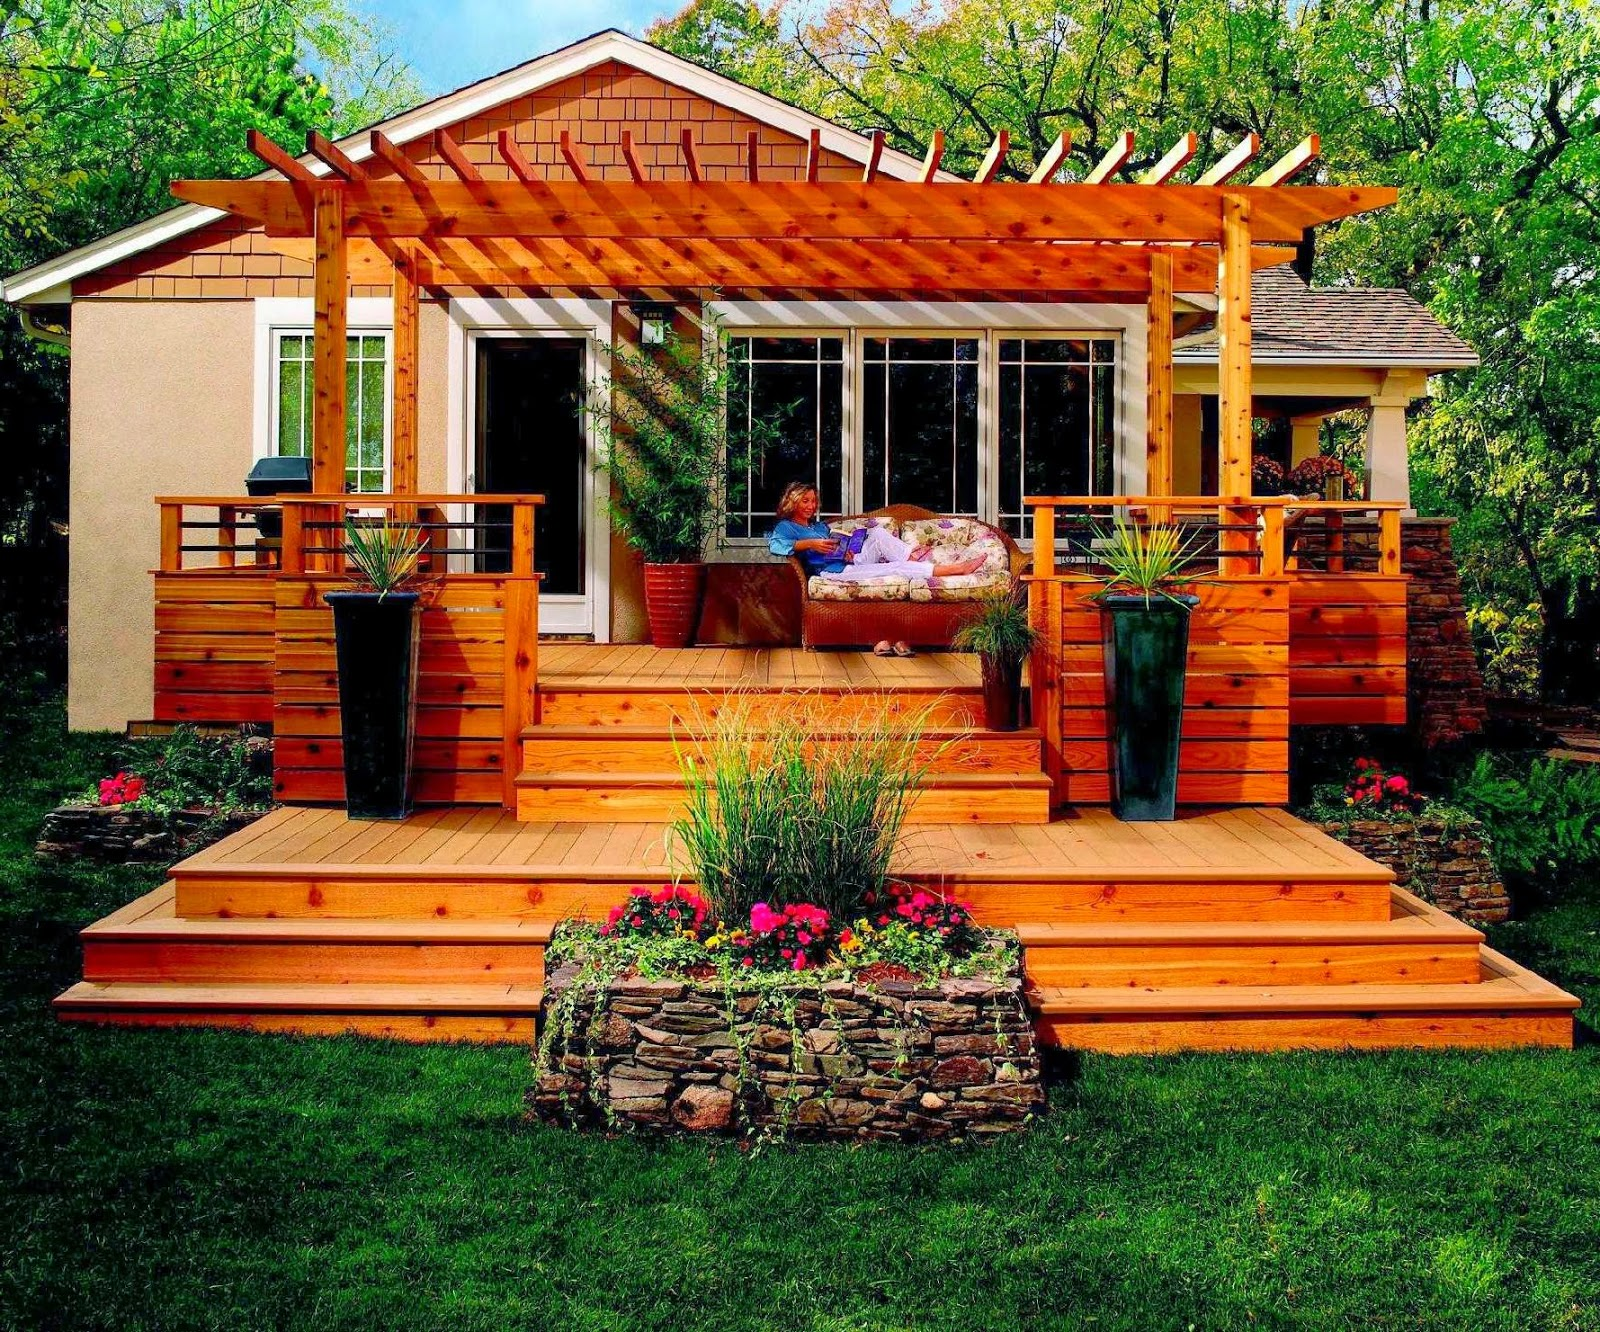 Awesome backyard deck design | Backyard Design Ideas